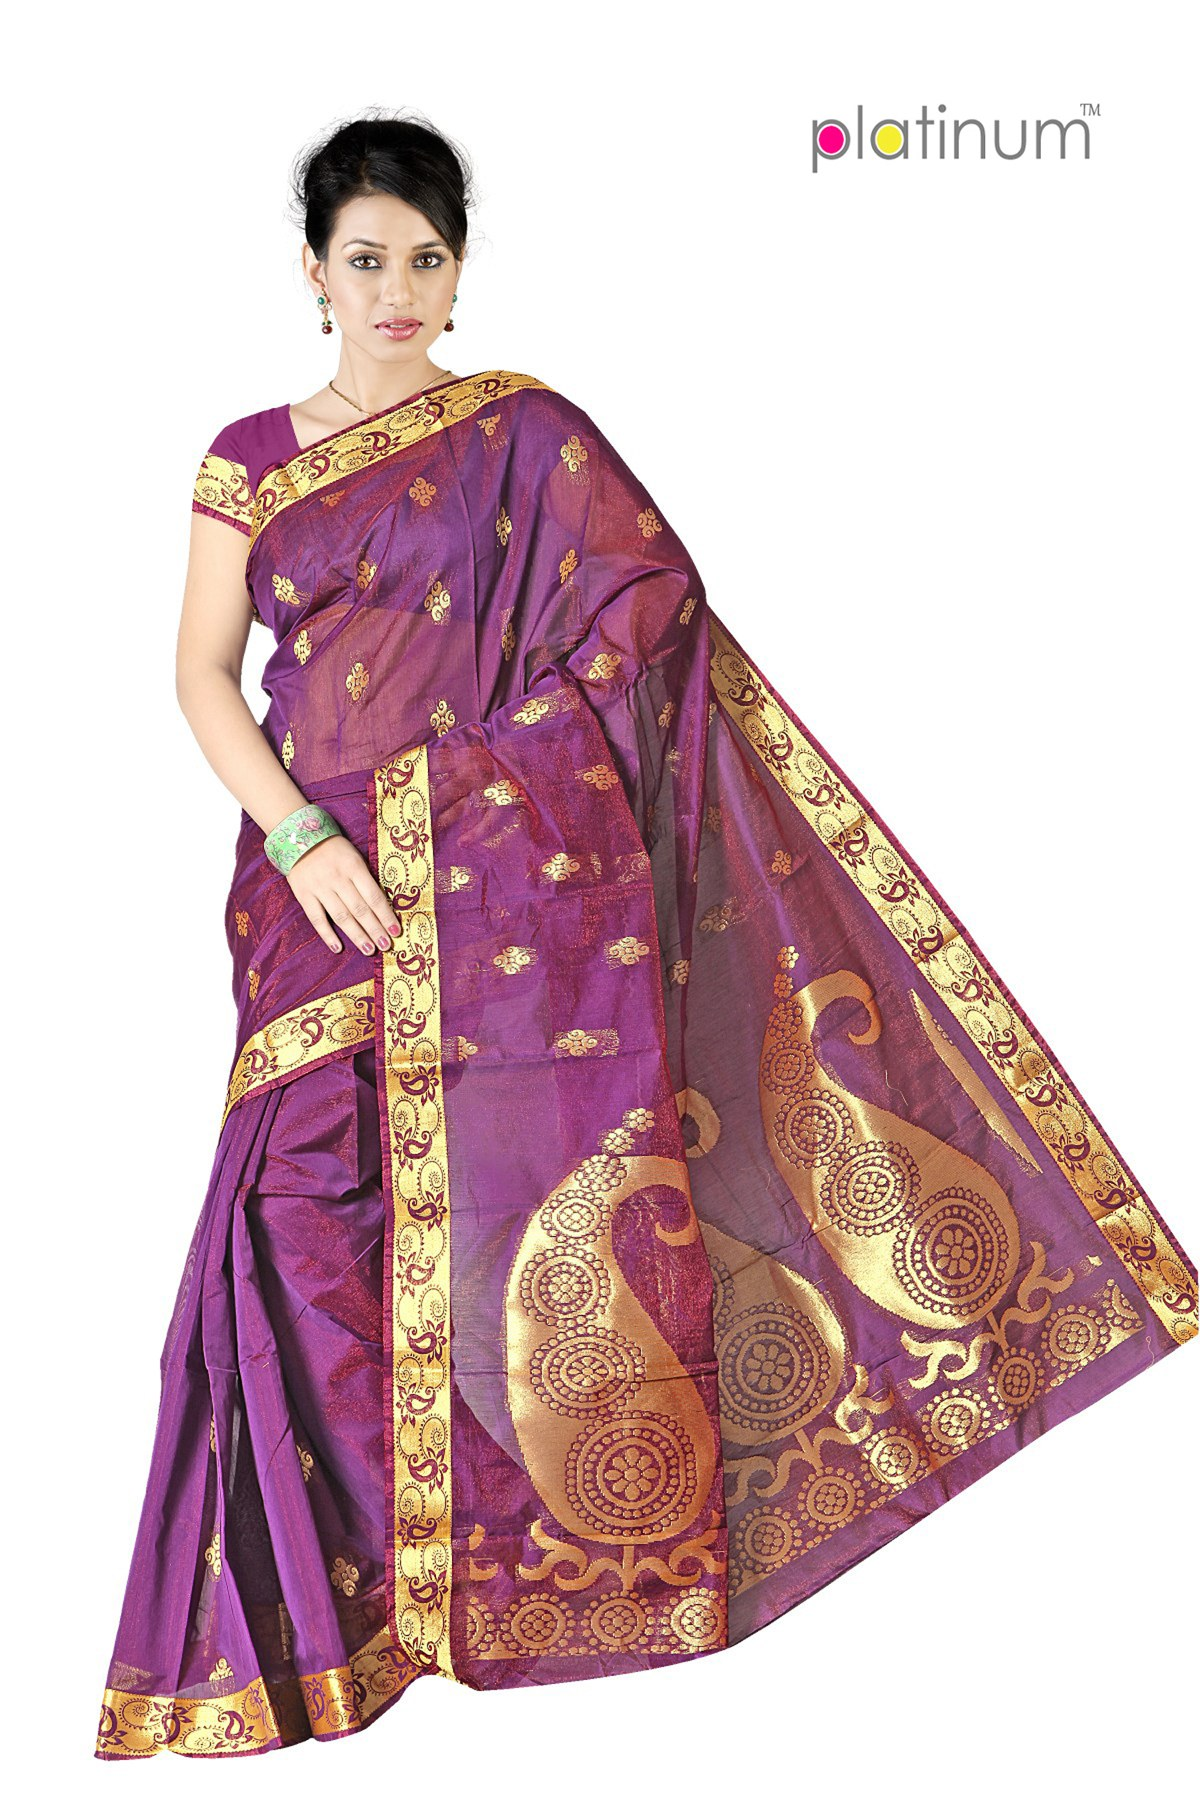 imperial purple designer zari saree ps341 online shopping for silk sarees by platinum online. Black Bedroom Furniture Sets. Home Design Ideas